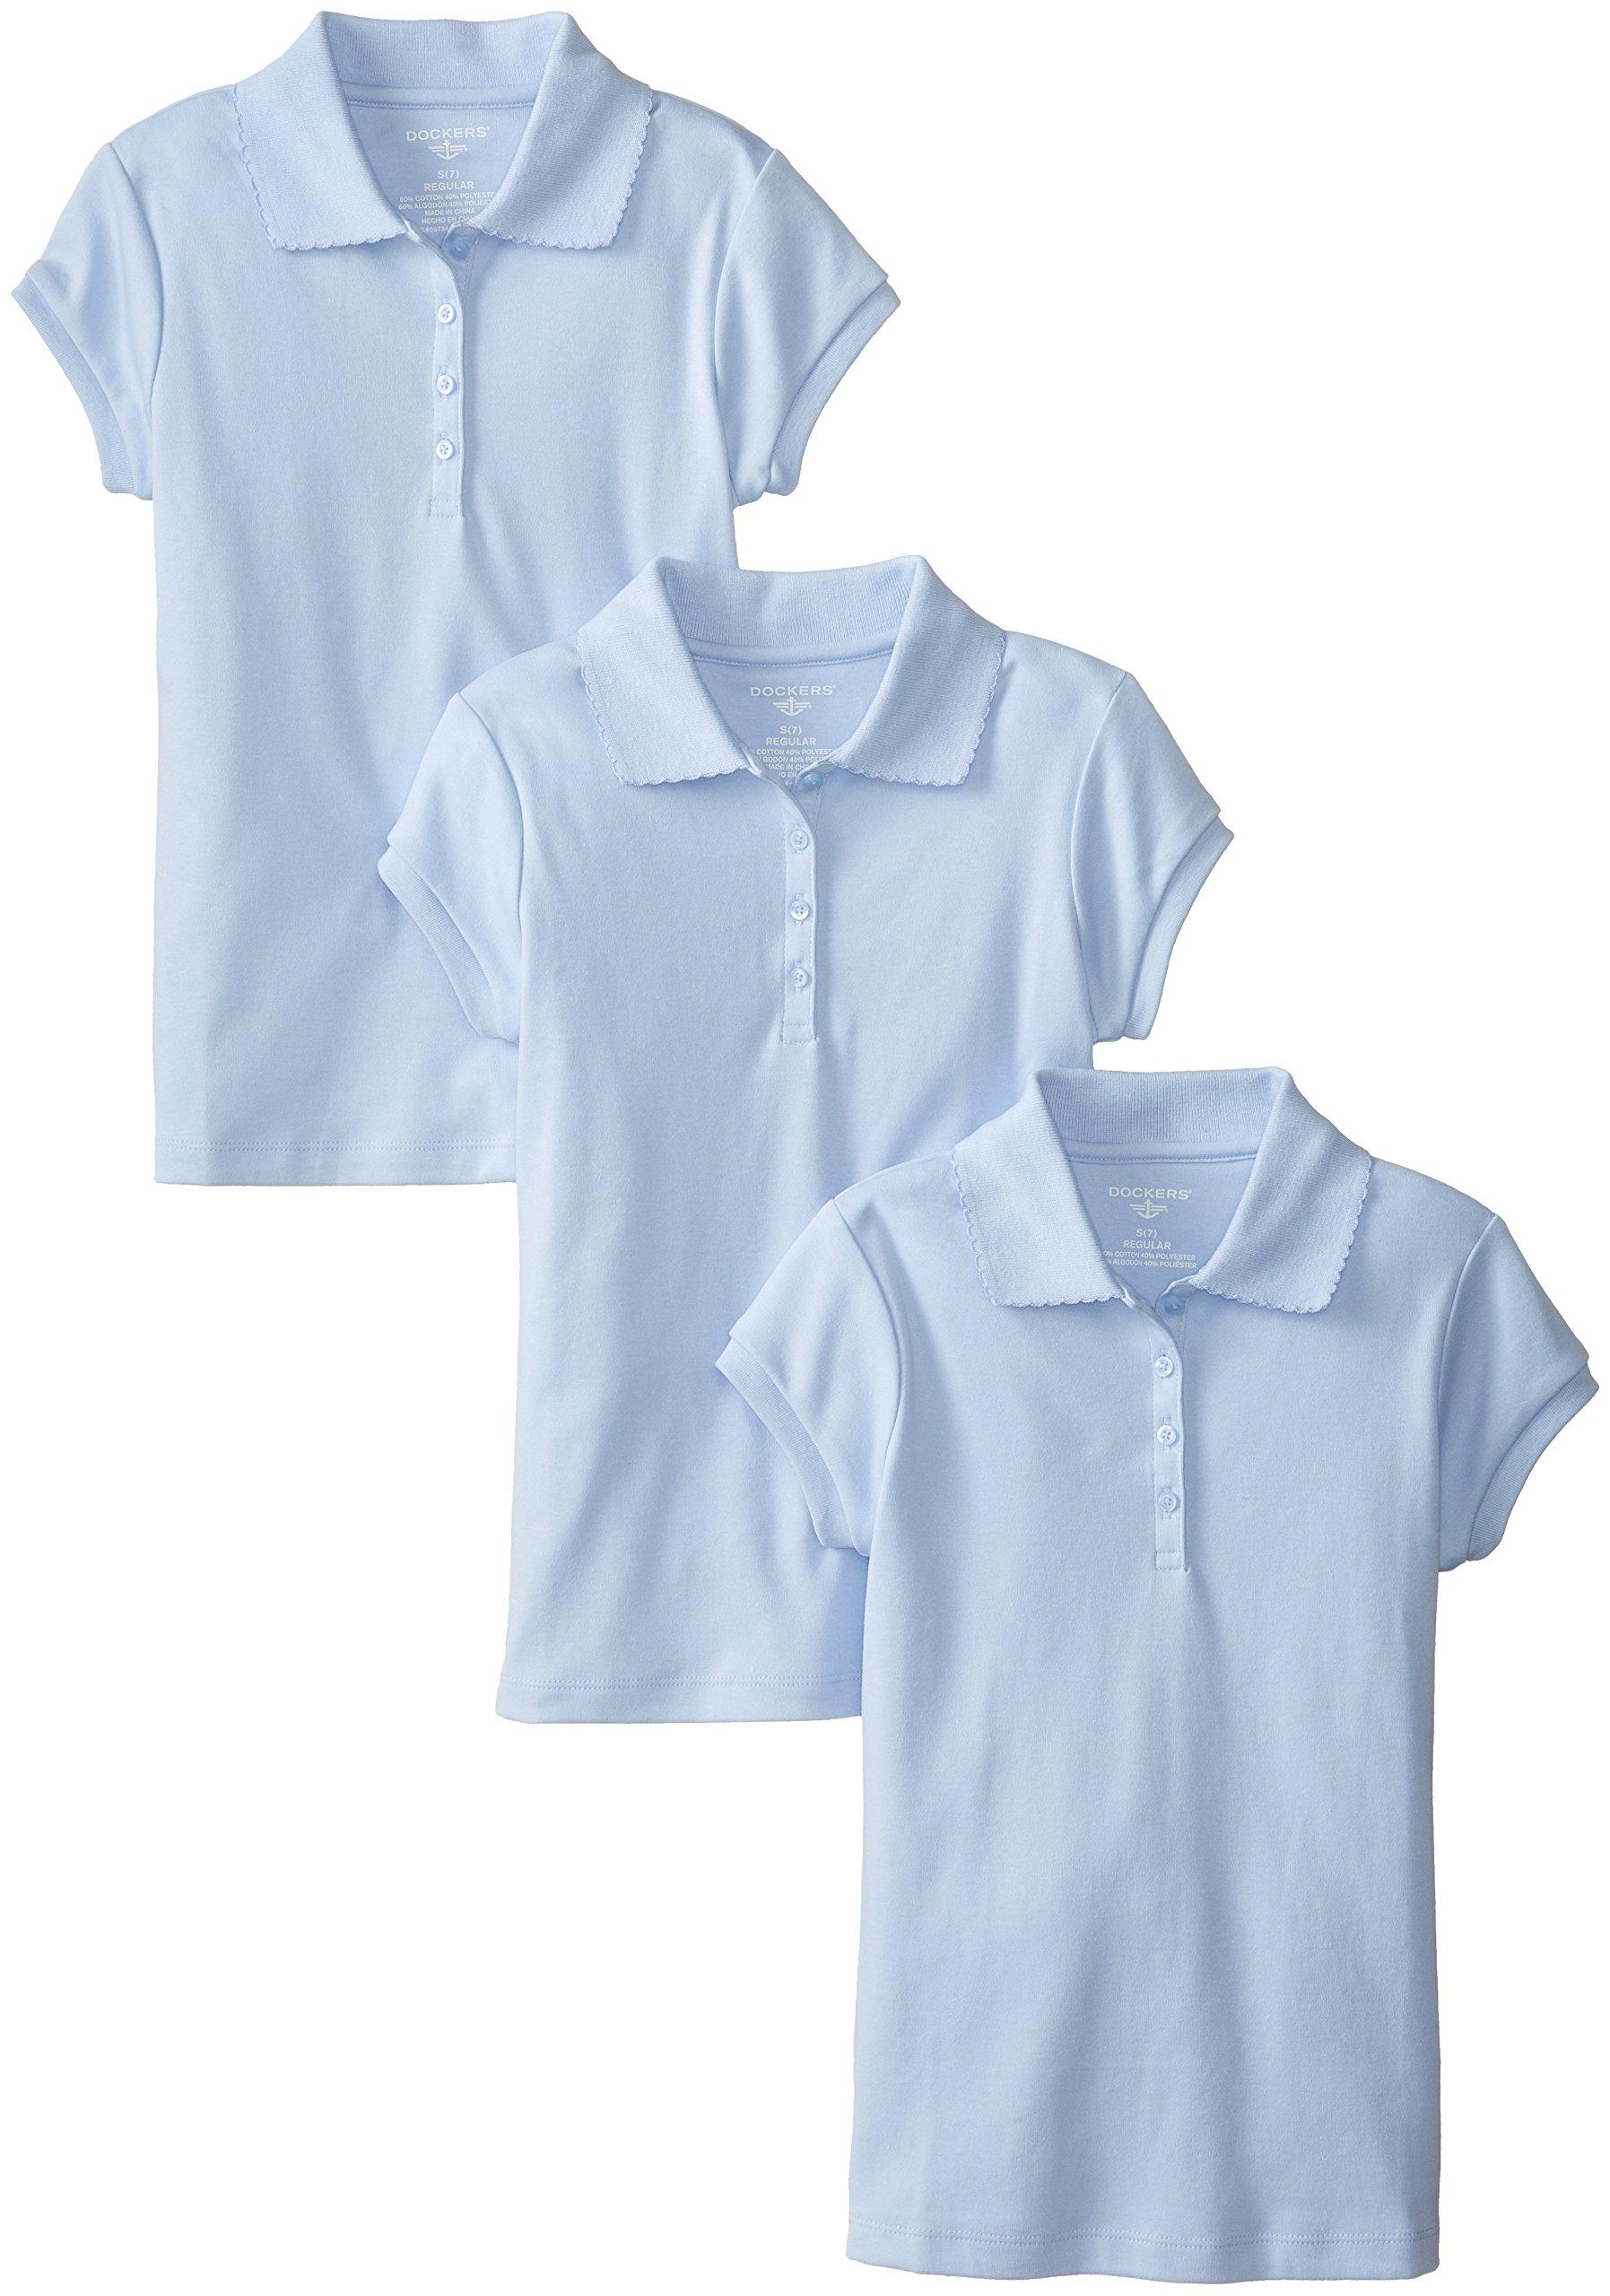 Dockers Big Girls' Plus-Size Uniform 3 Pack Short Sleeve Polo Bundle, Light Blue, Large